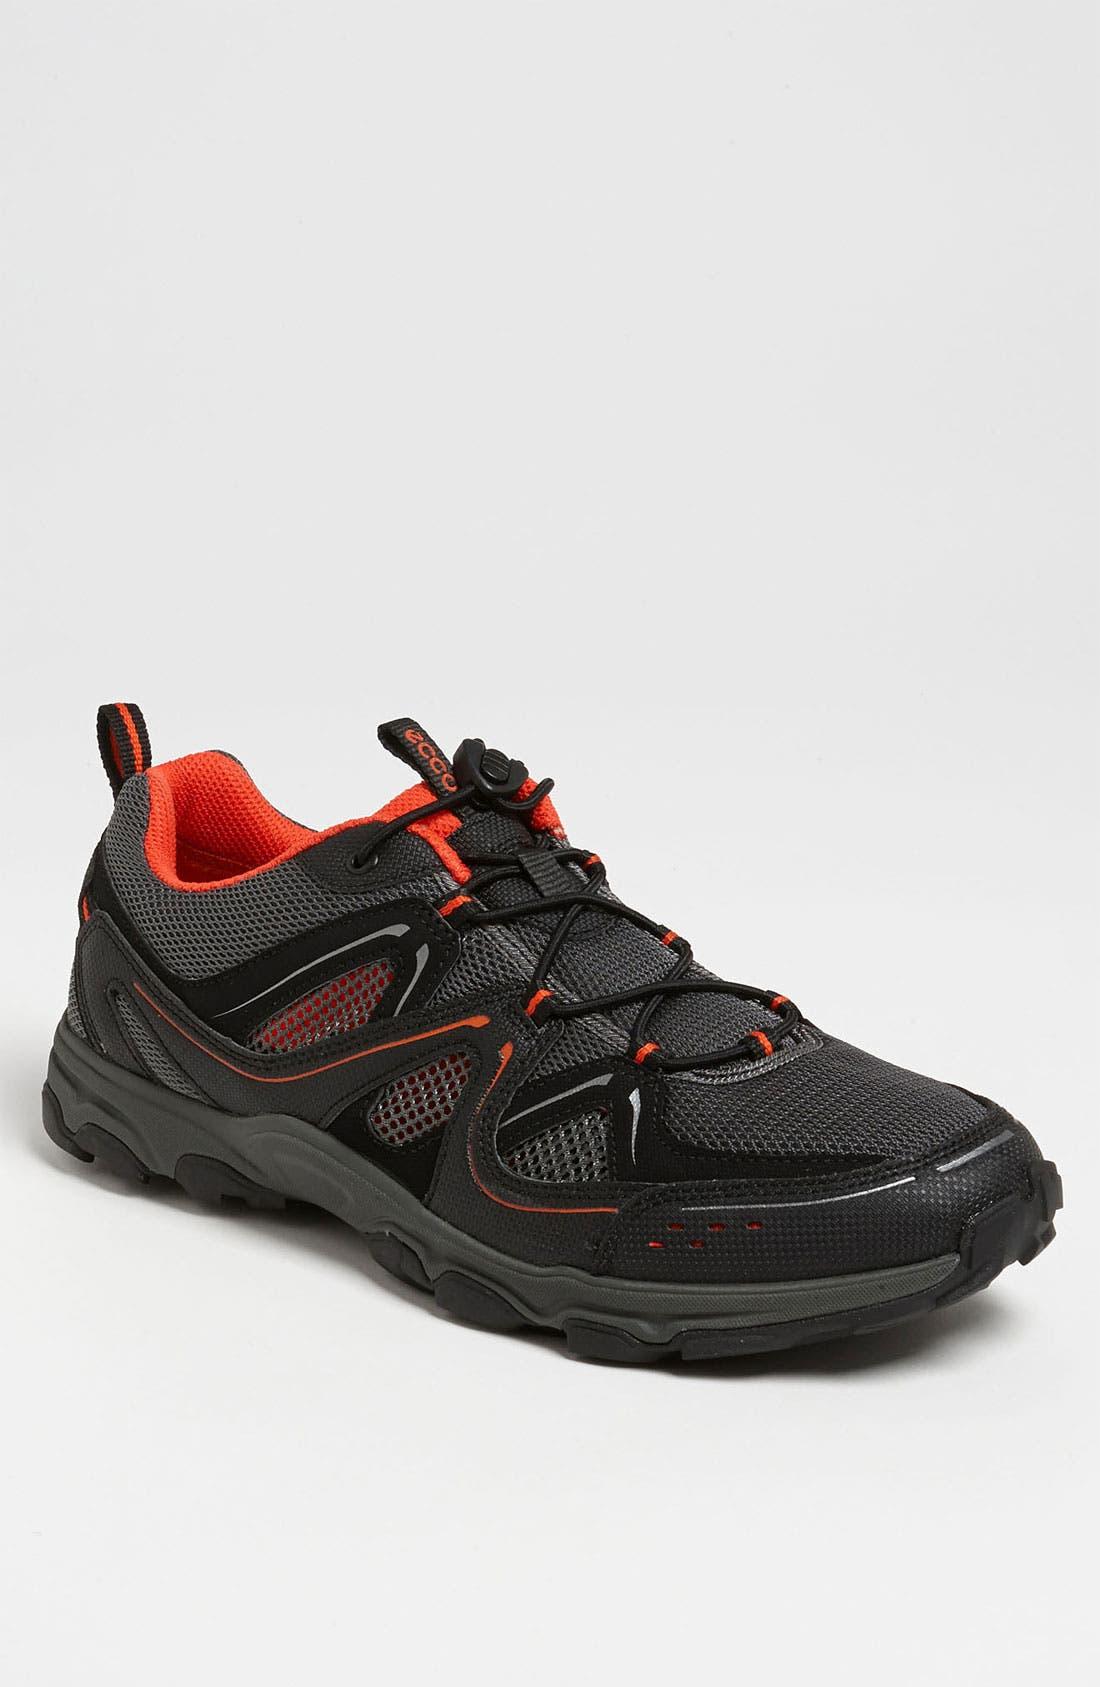 Alternate Image 1 Selected - ECCO 'Venture' Training Shoe (Men)